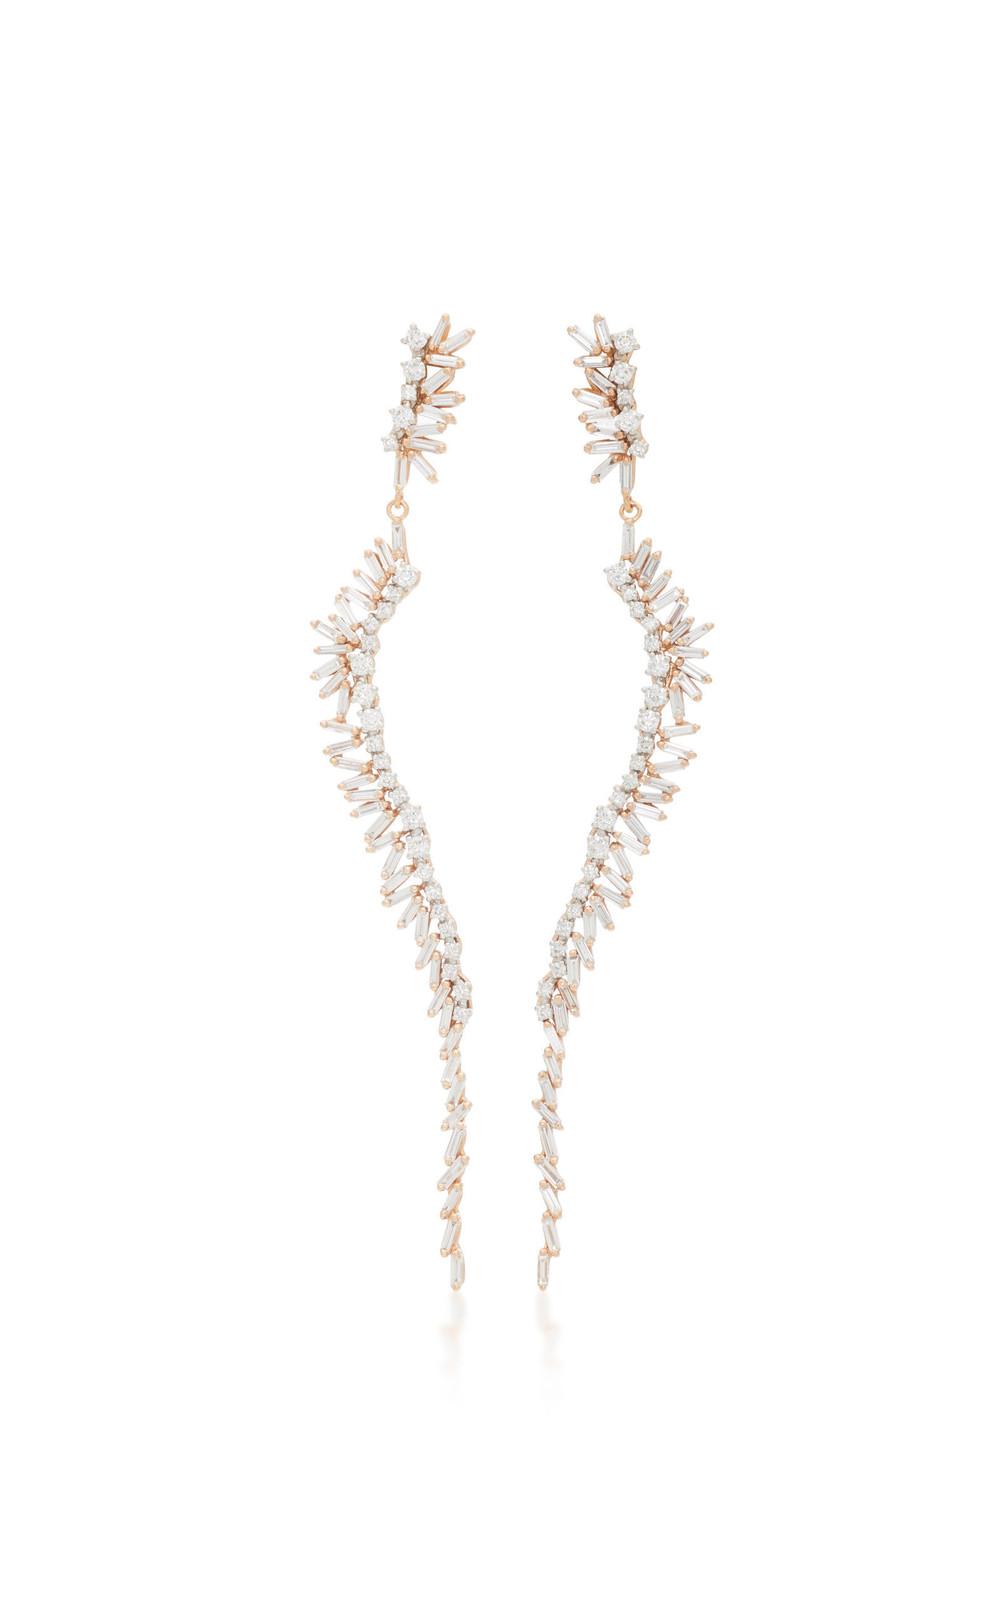 Suzanne Kalan 18K Rose Gold Diamond Earrings in pink